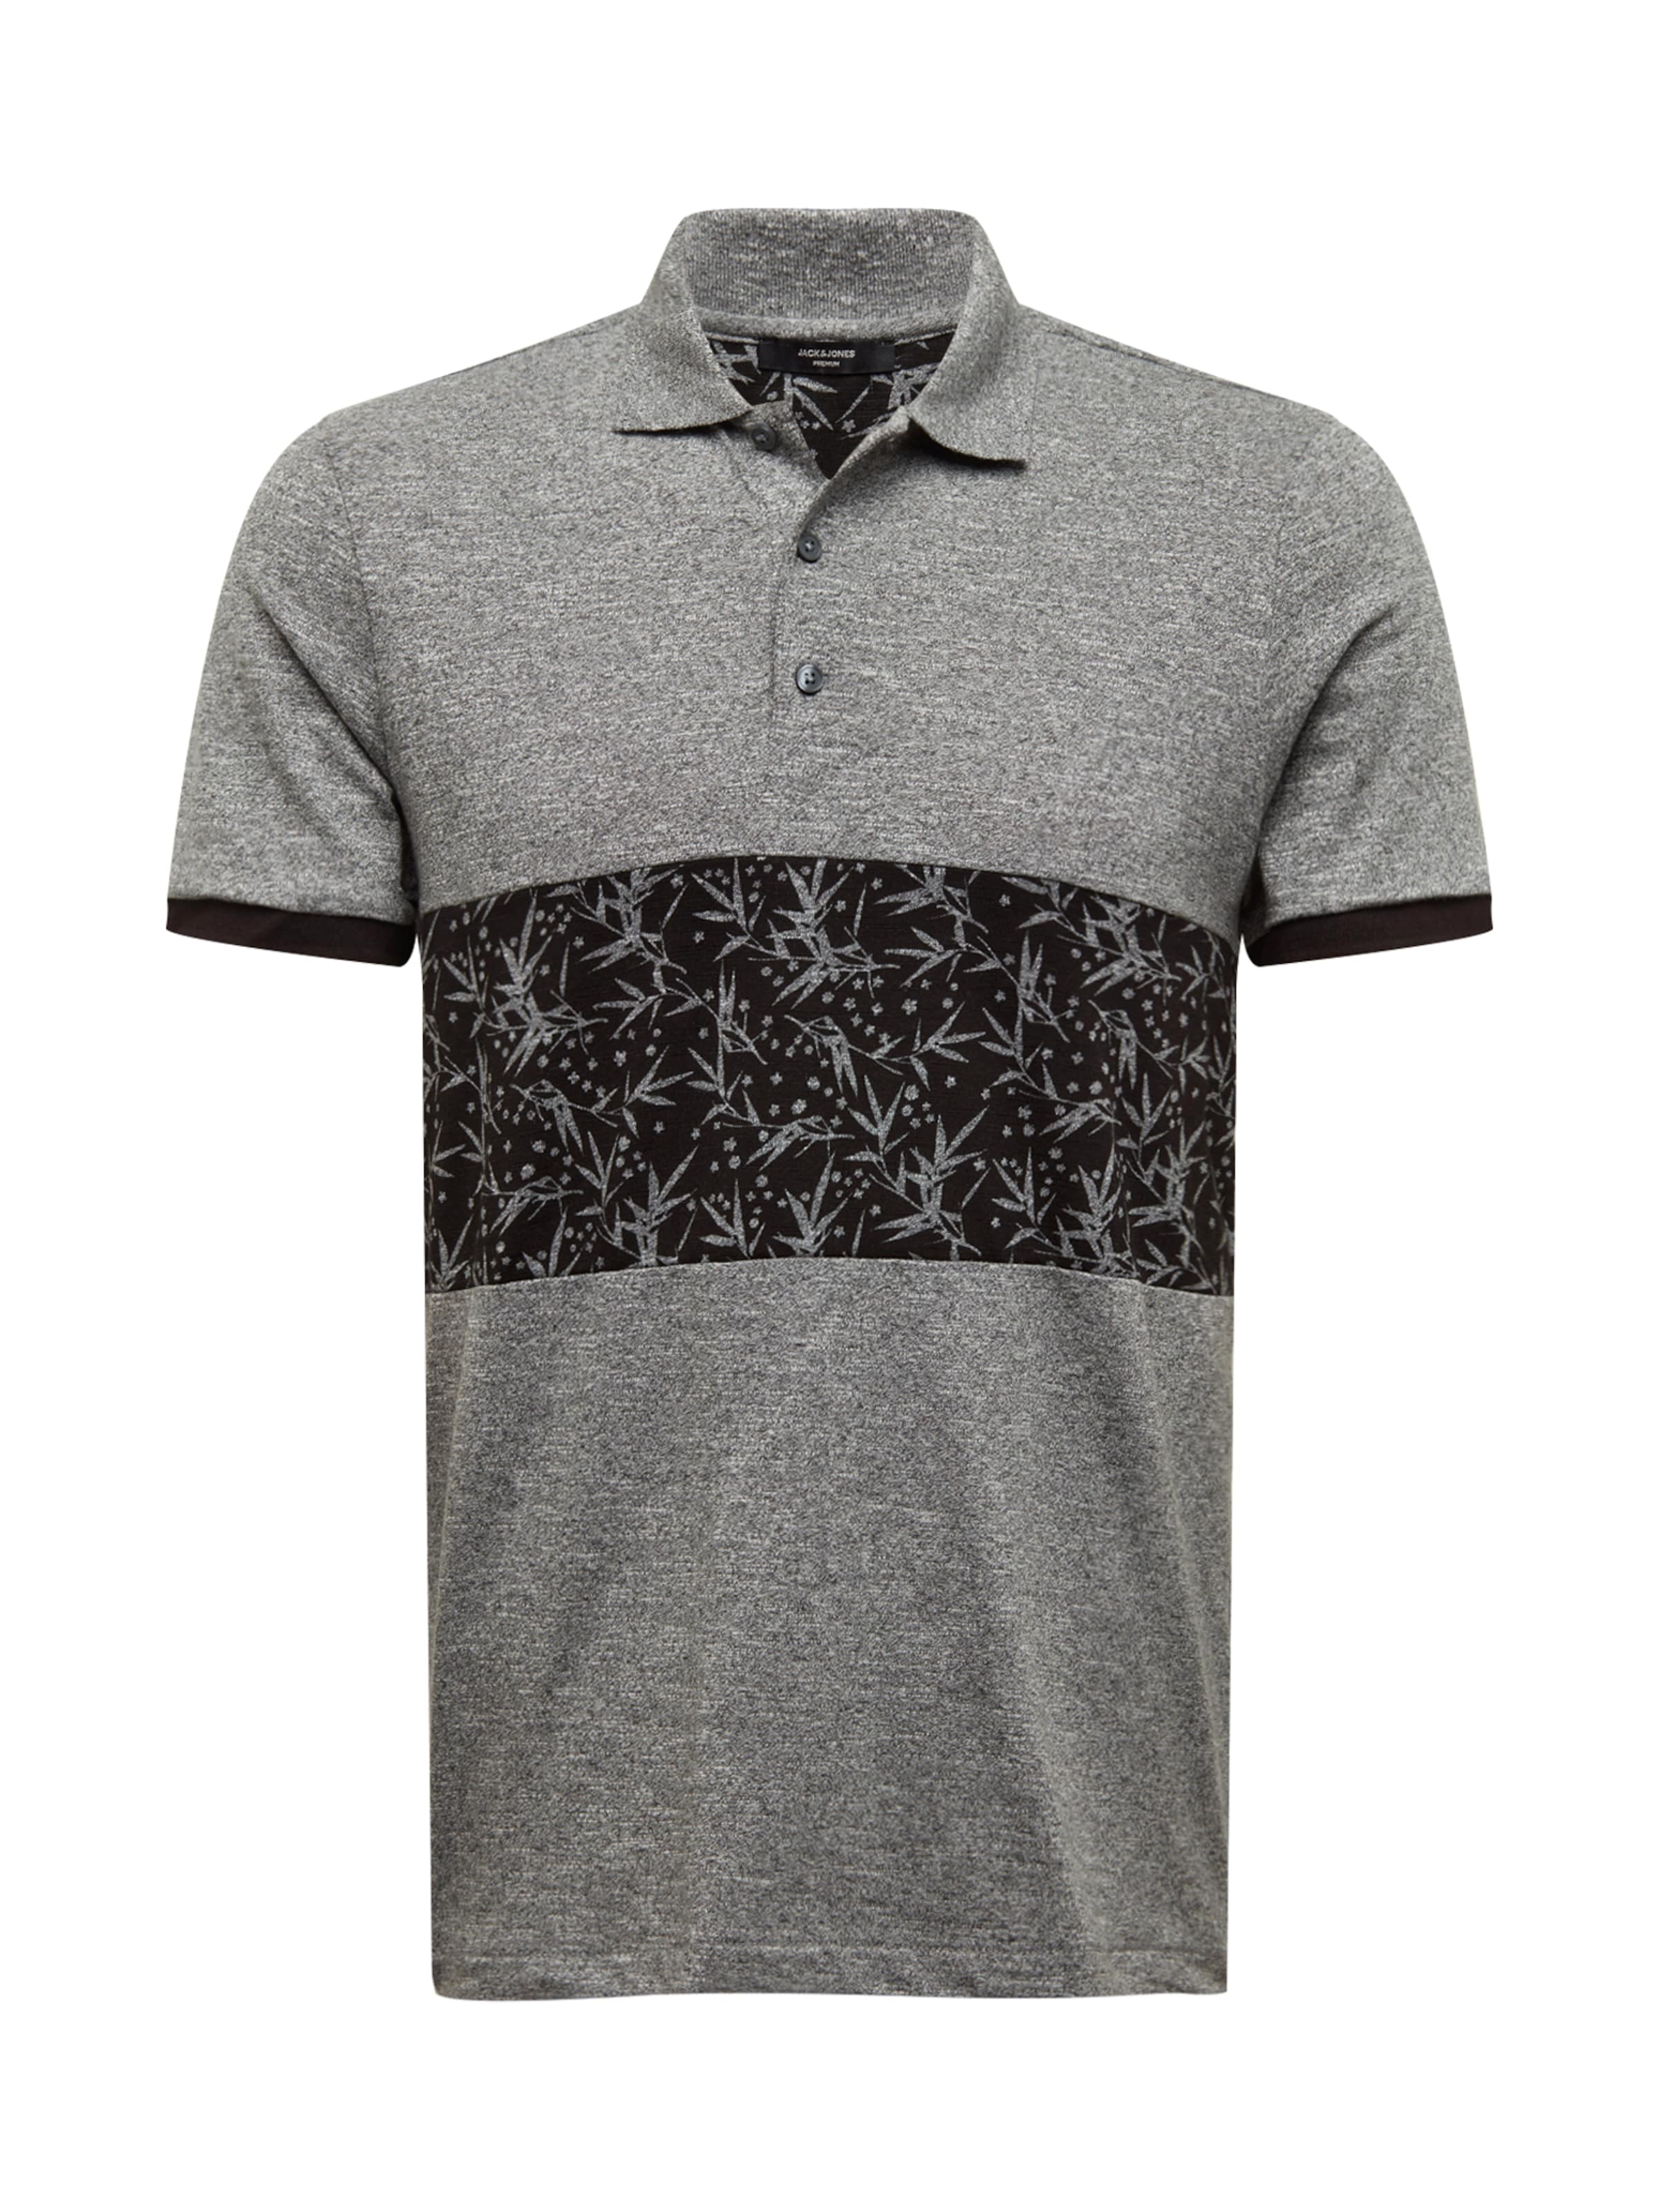 ' En Bla T 'vitus Jones shirt ChinéNoir Jackamp; Gris 2DEIH9